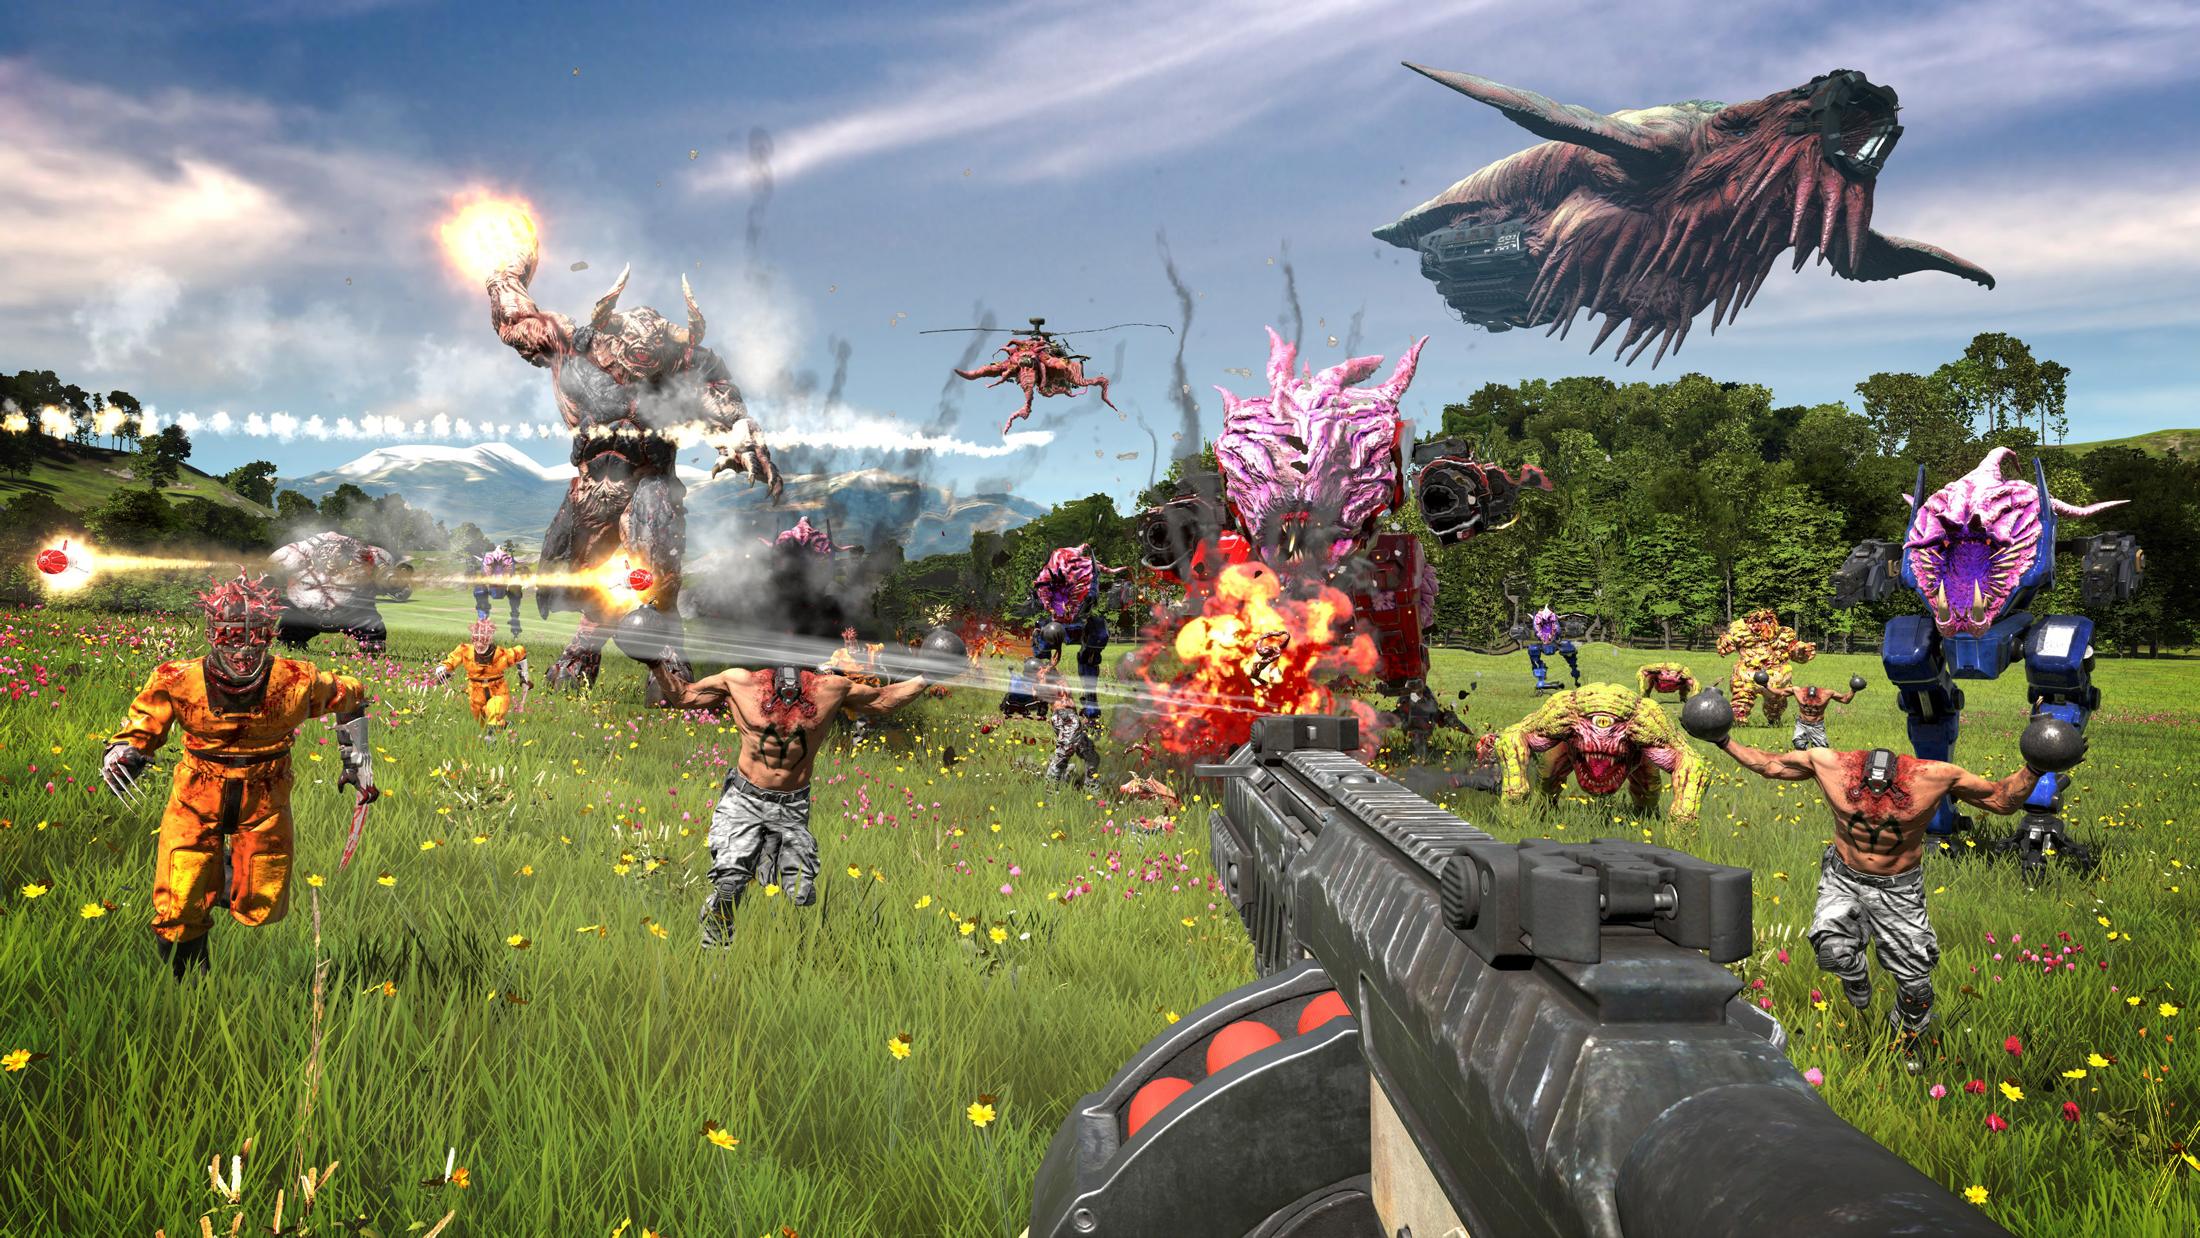 Serious Sam 4 shotguns its way onto PC and Stadia this August screenshot